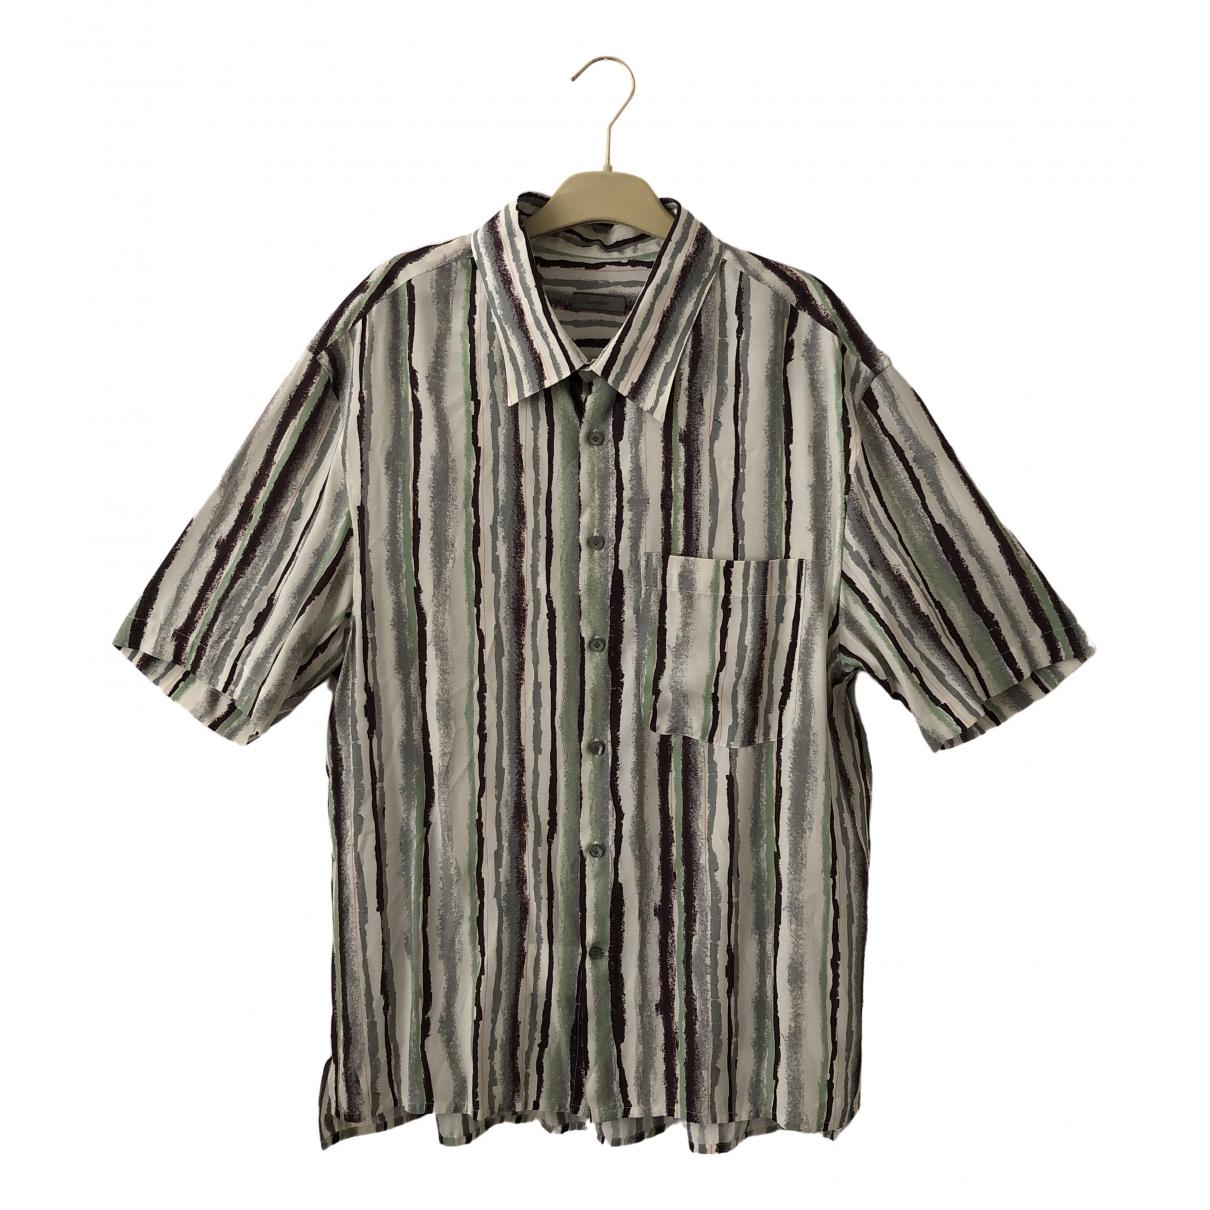 Lanvin \N White Shirts for Men 38 EU (tour de cou / collar)